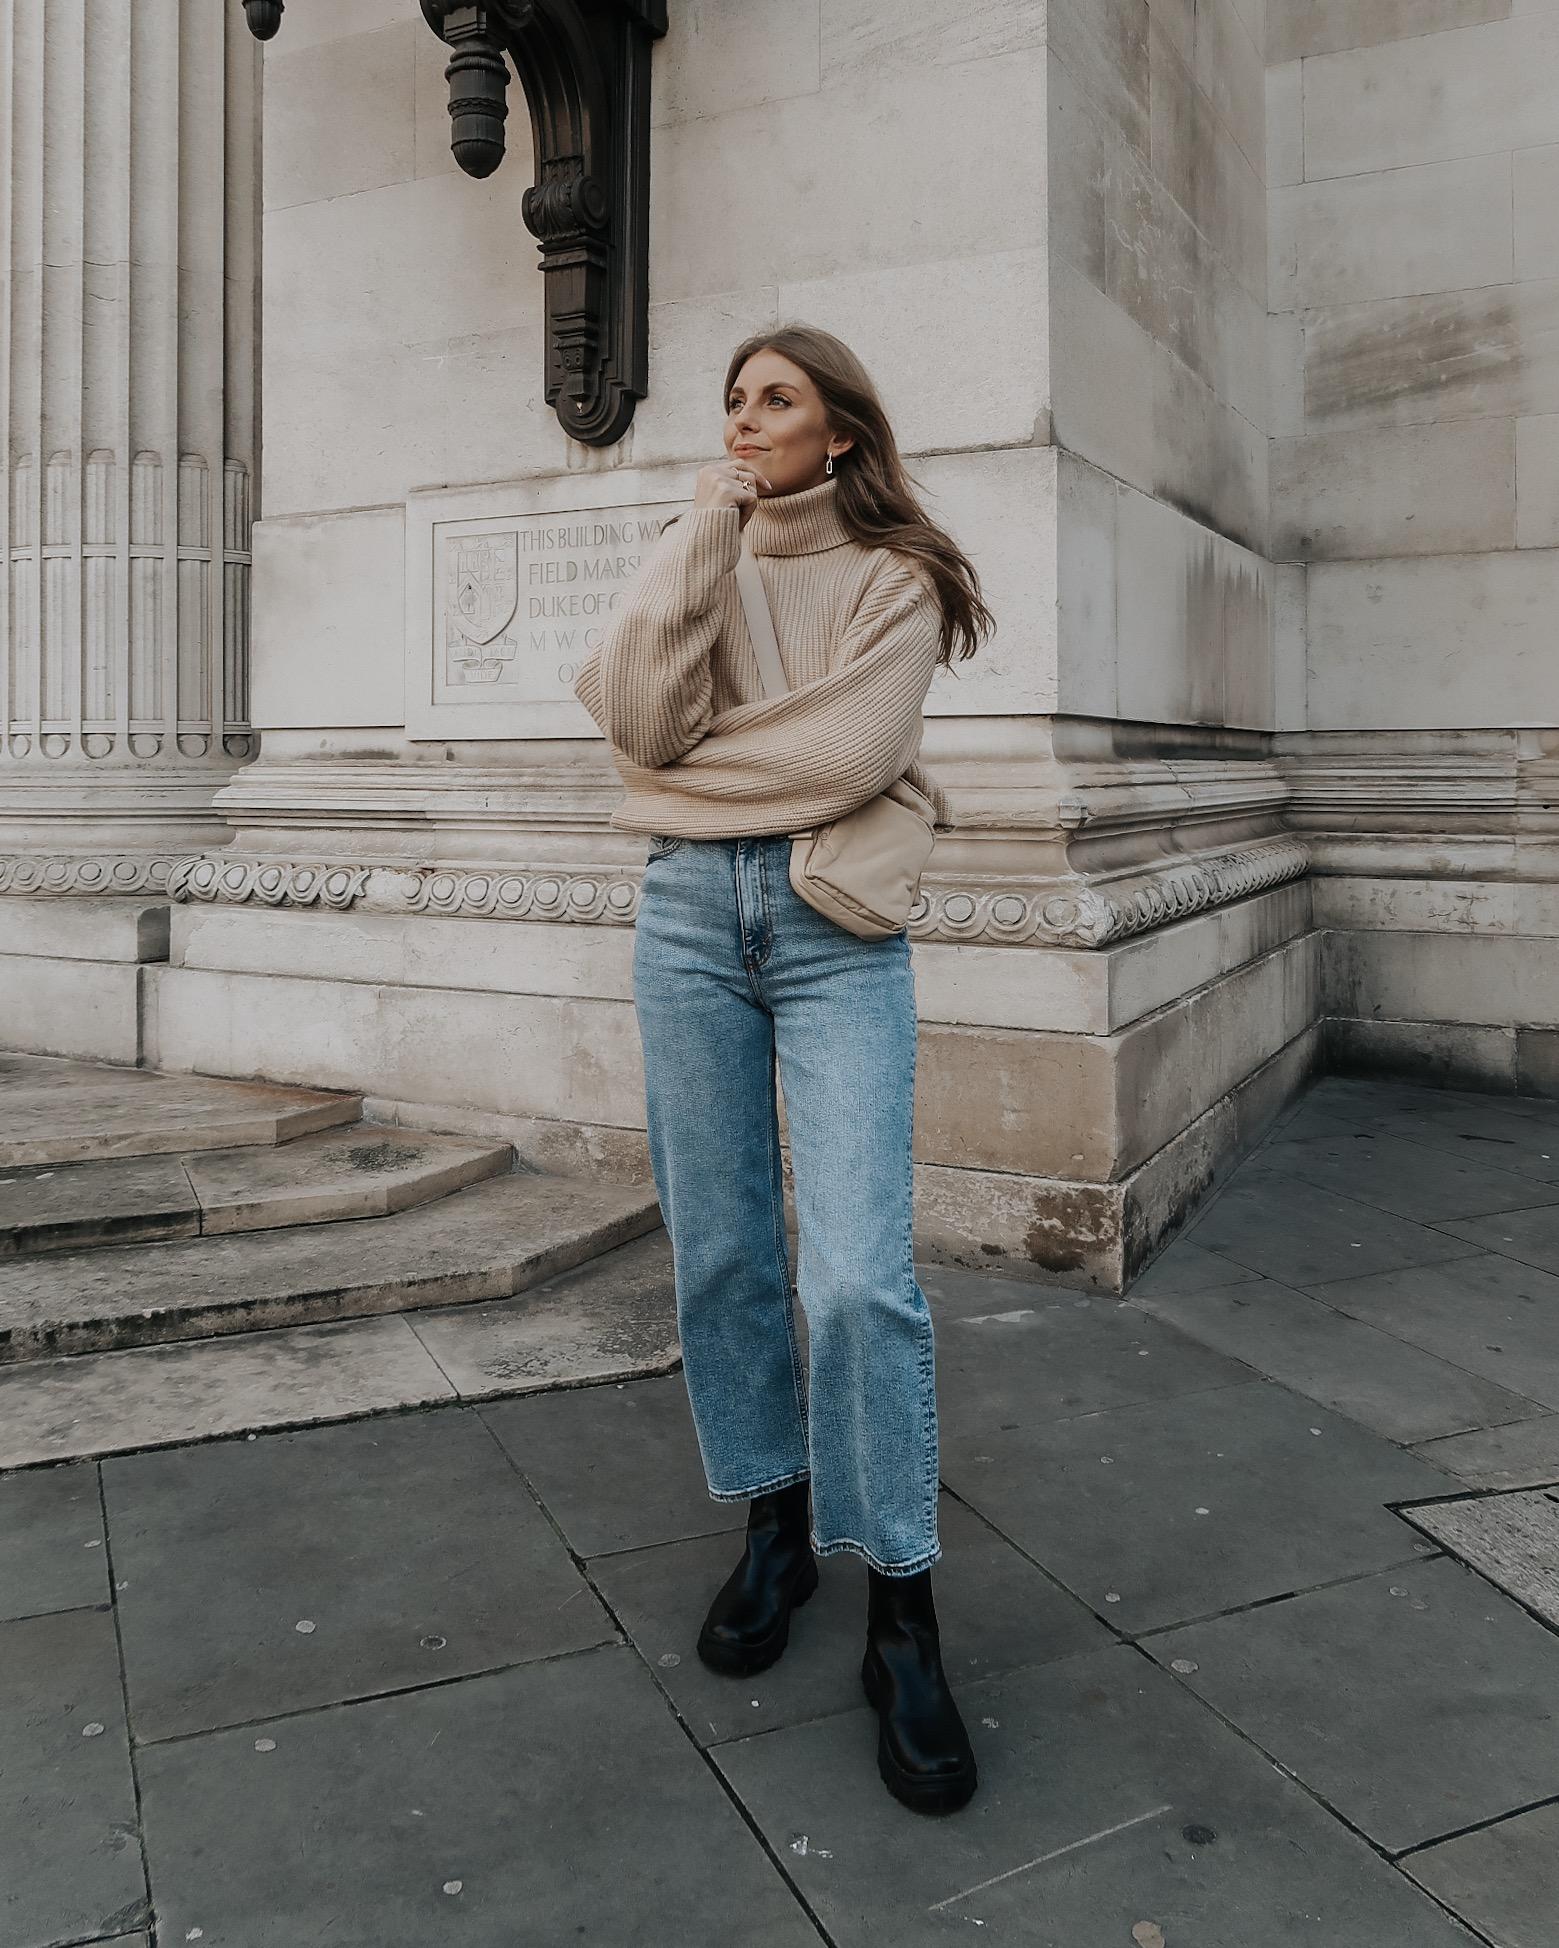 Monki Jeans - London Street Style